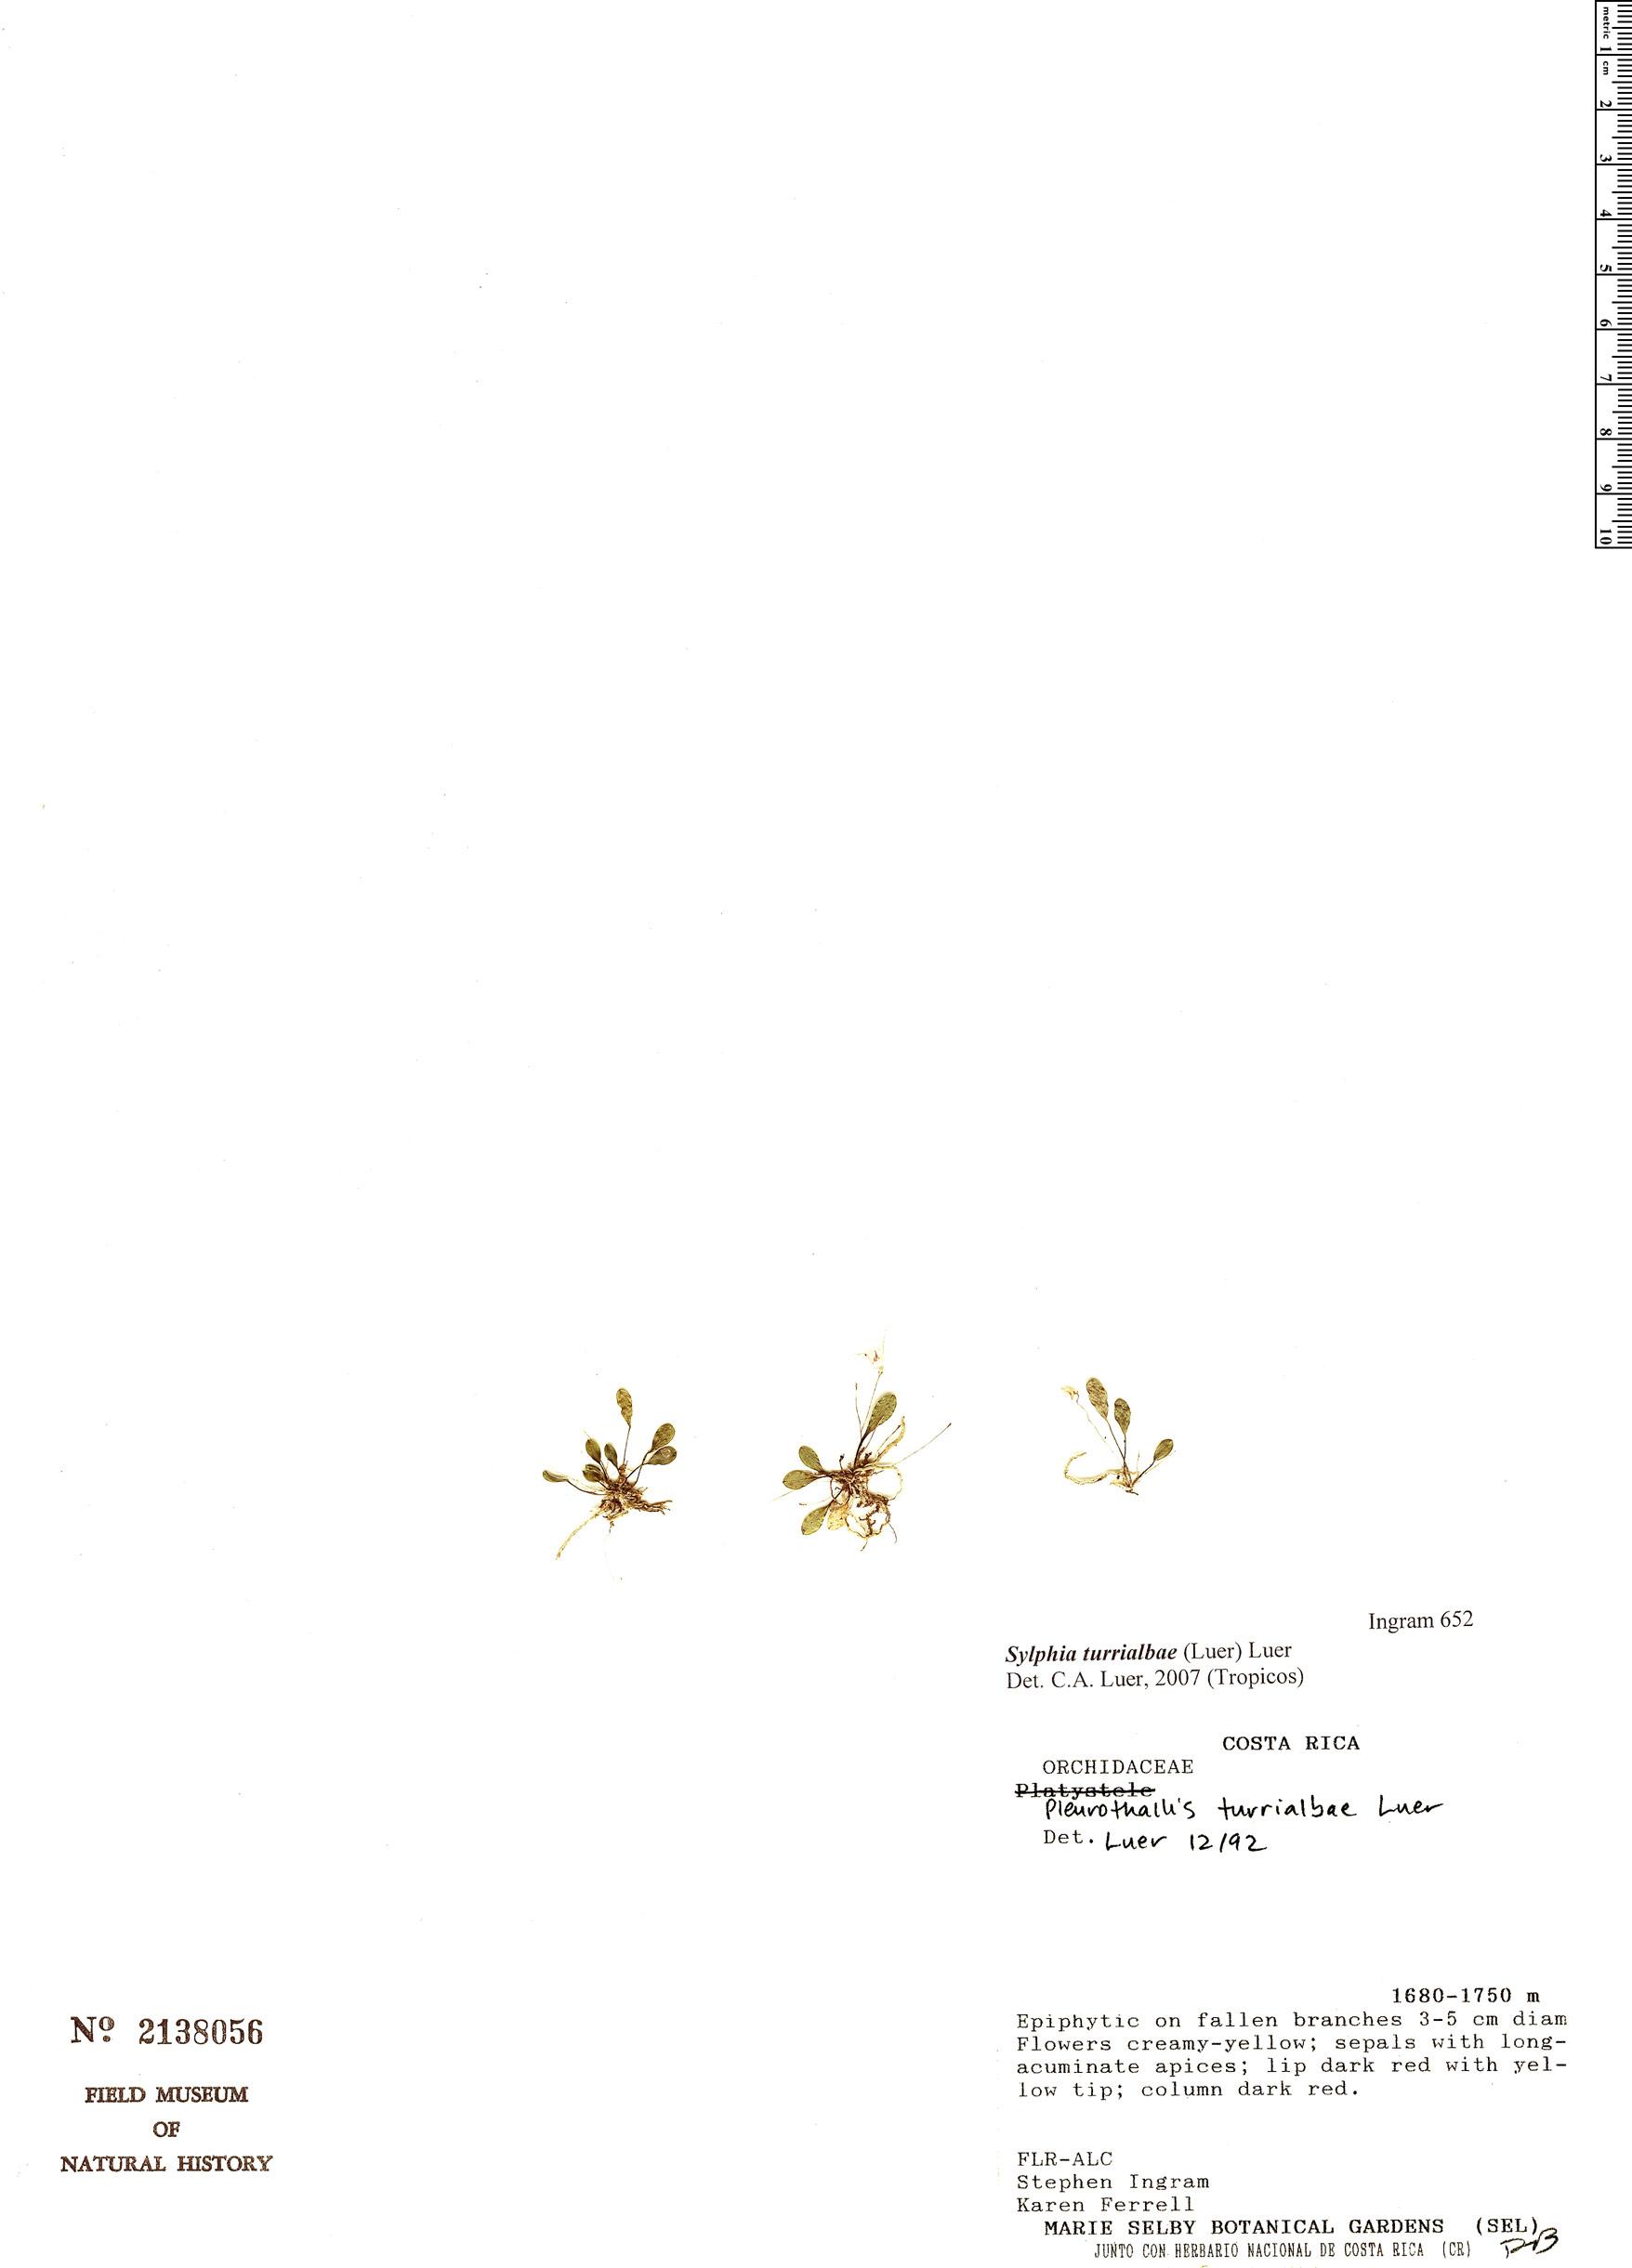 Specimen: Pleurothallis turrialbae